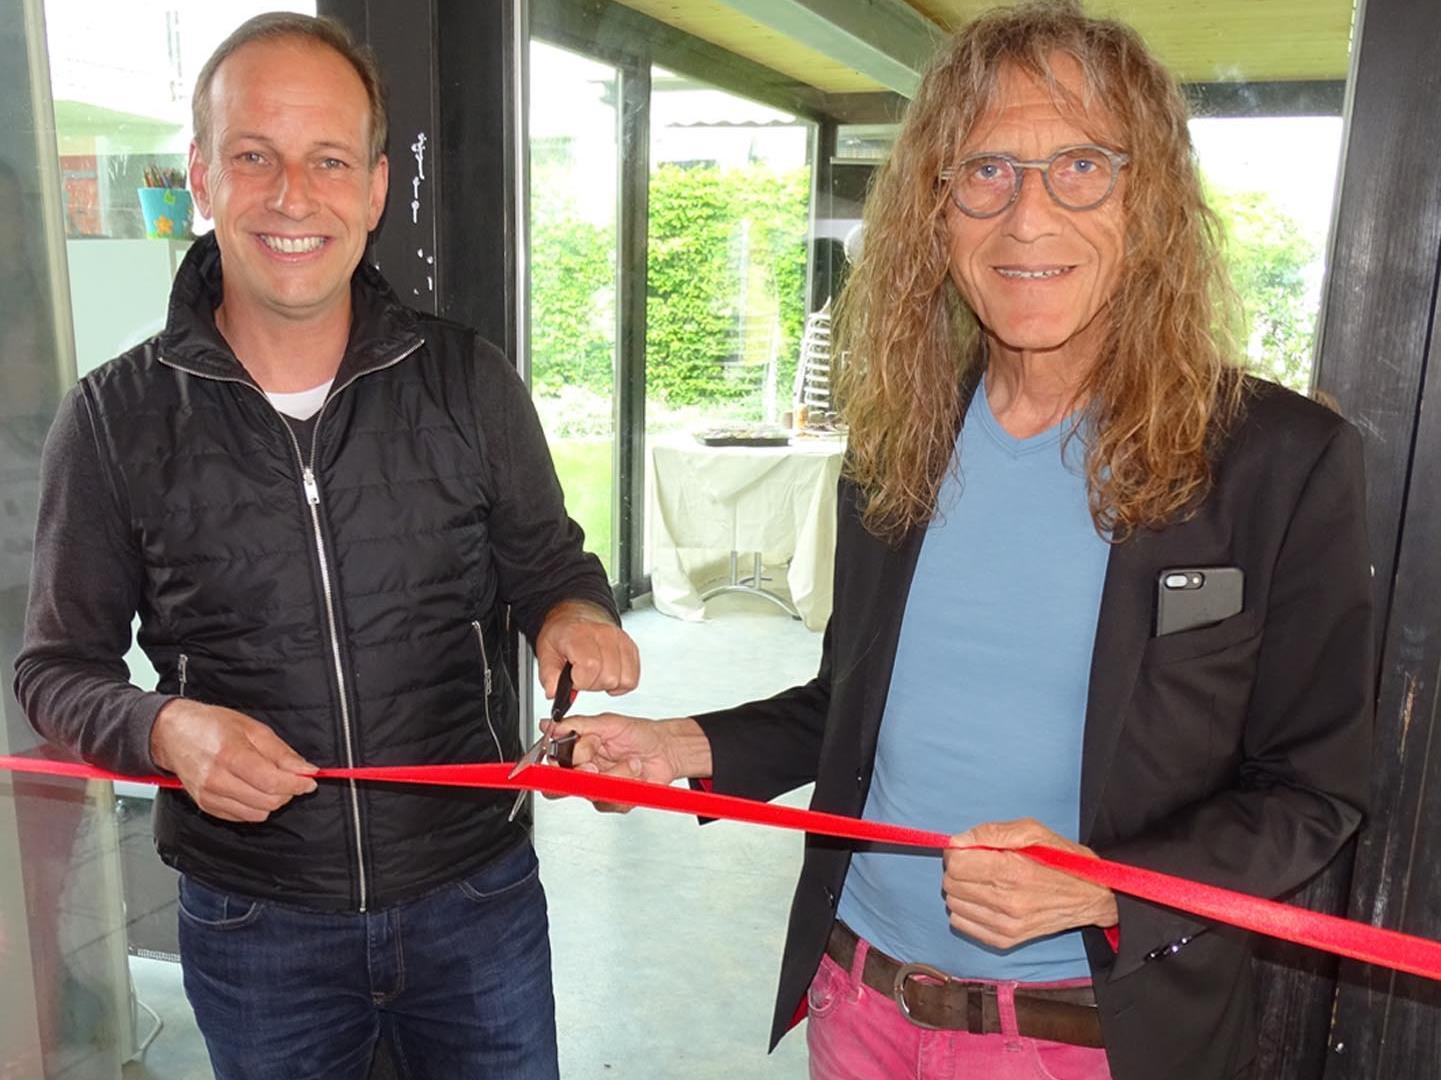 Bgm. Dieter Egger und Vize-Bgm. Bernhard Amann eröffneten den Gemeinschaftsraum.